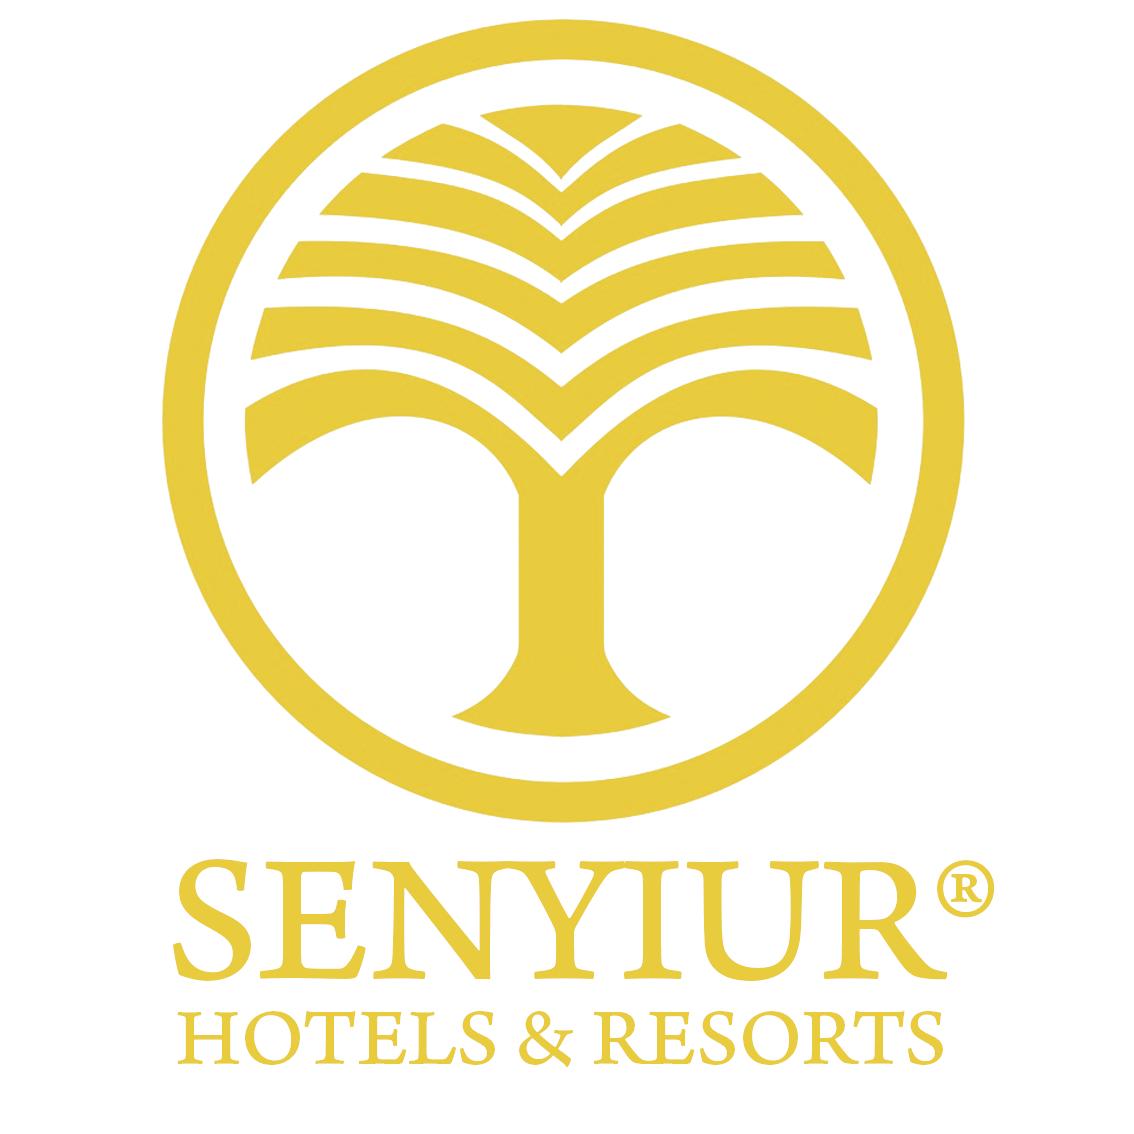 Welcome to Senyiur